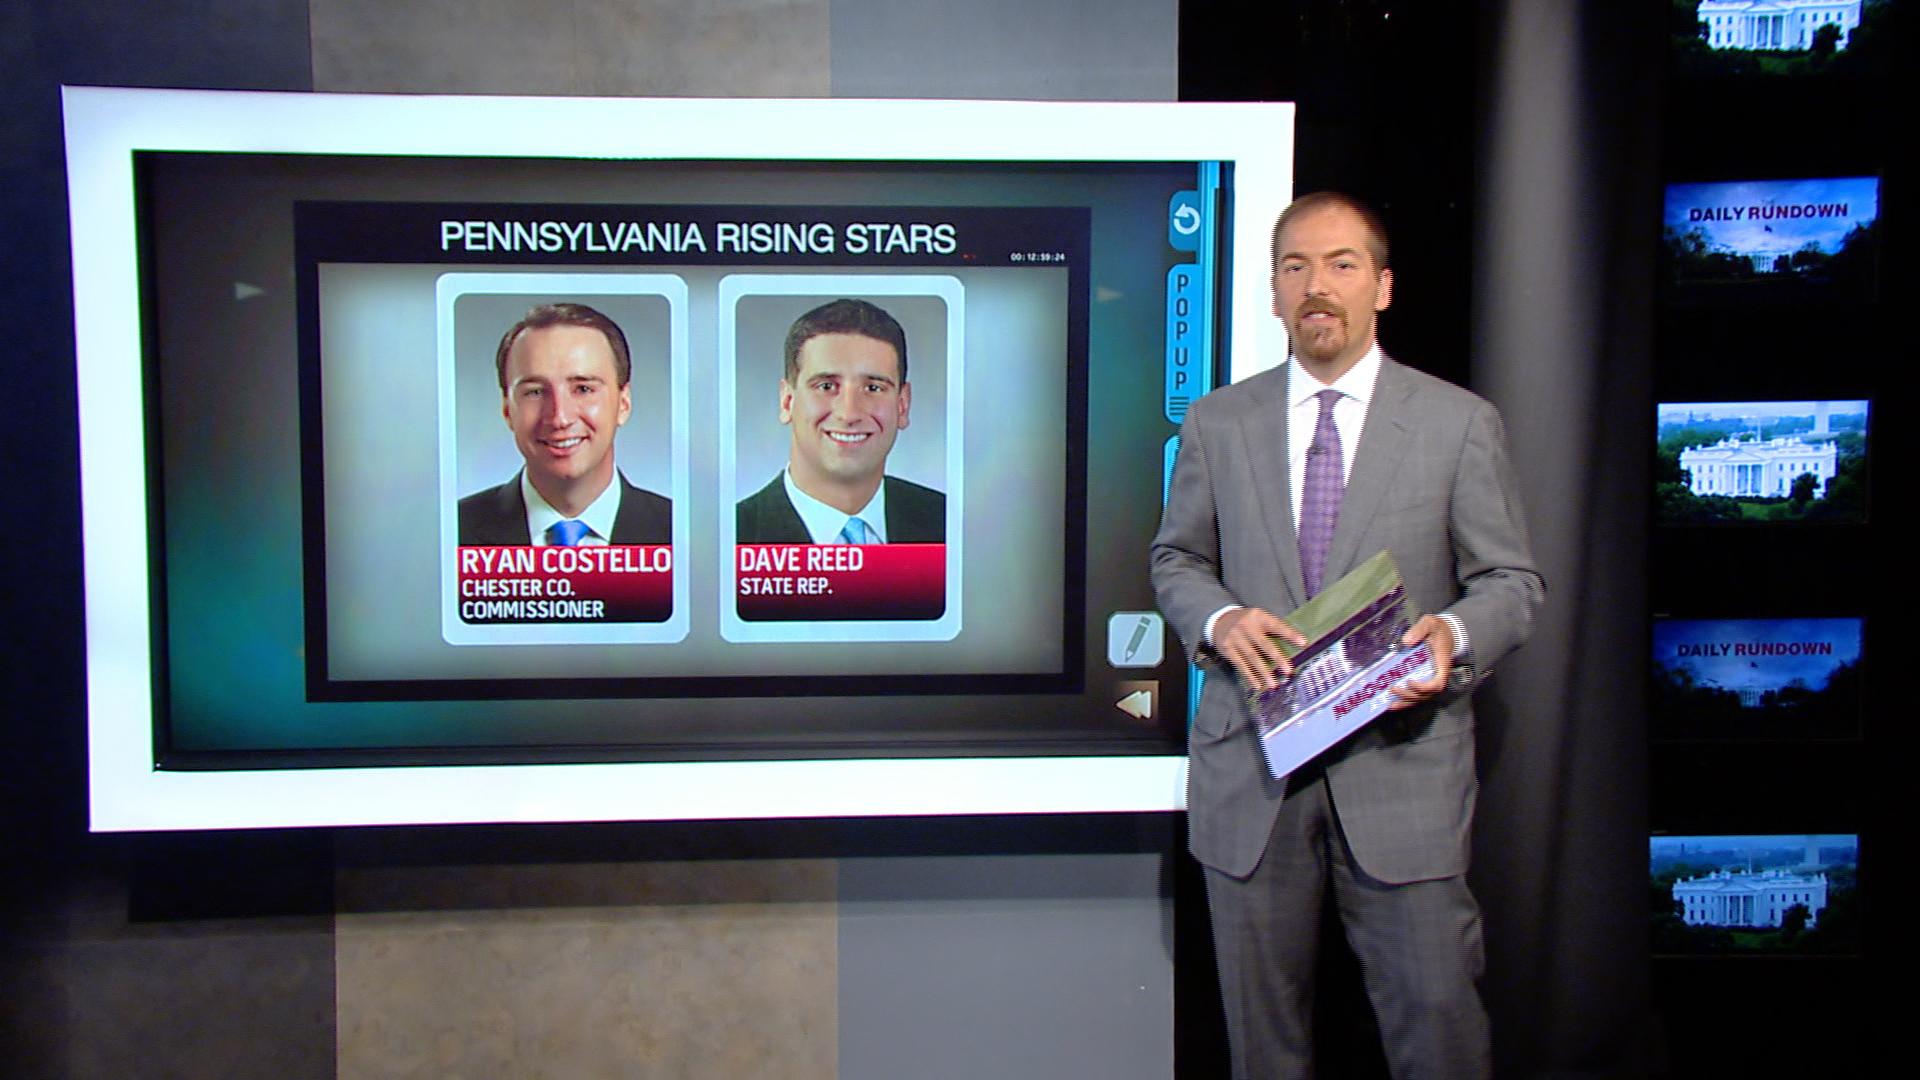 Meet Pennsylvania's rising political stars